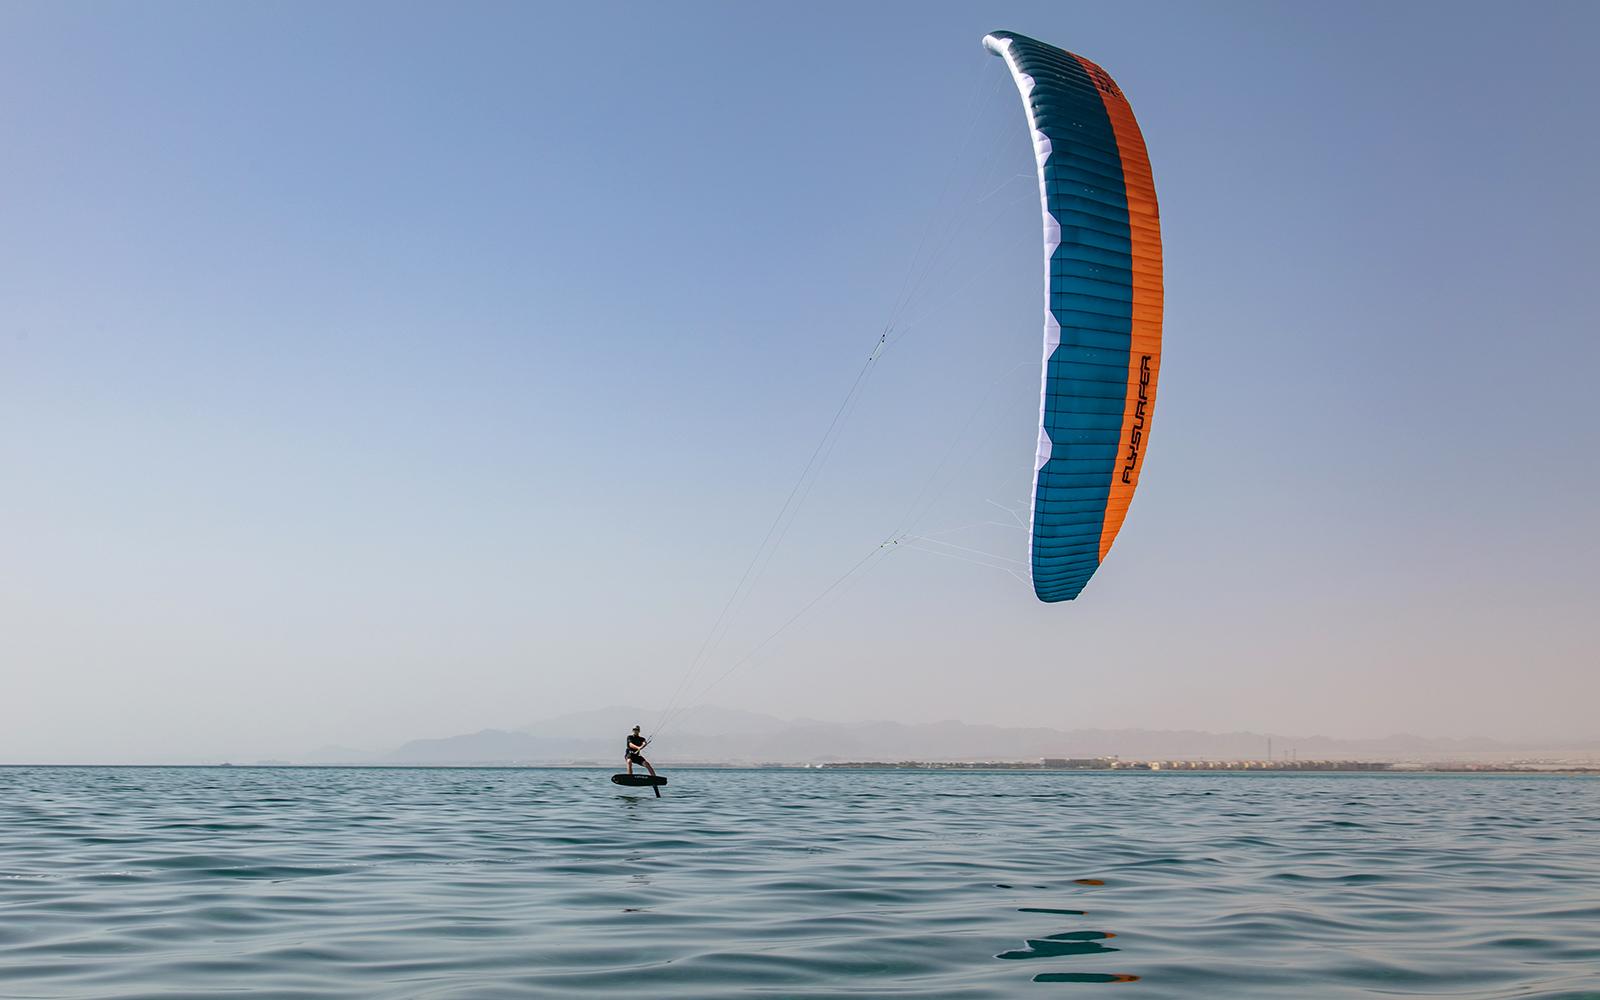 Light wind foiling (foilboarding)